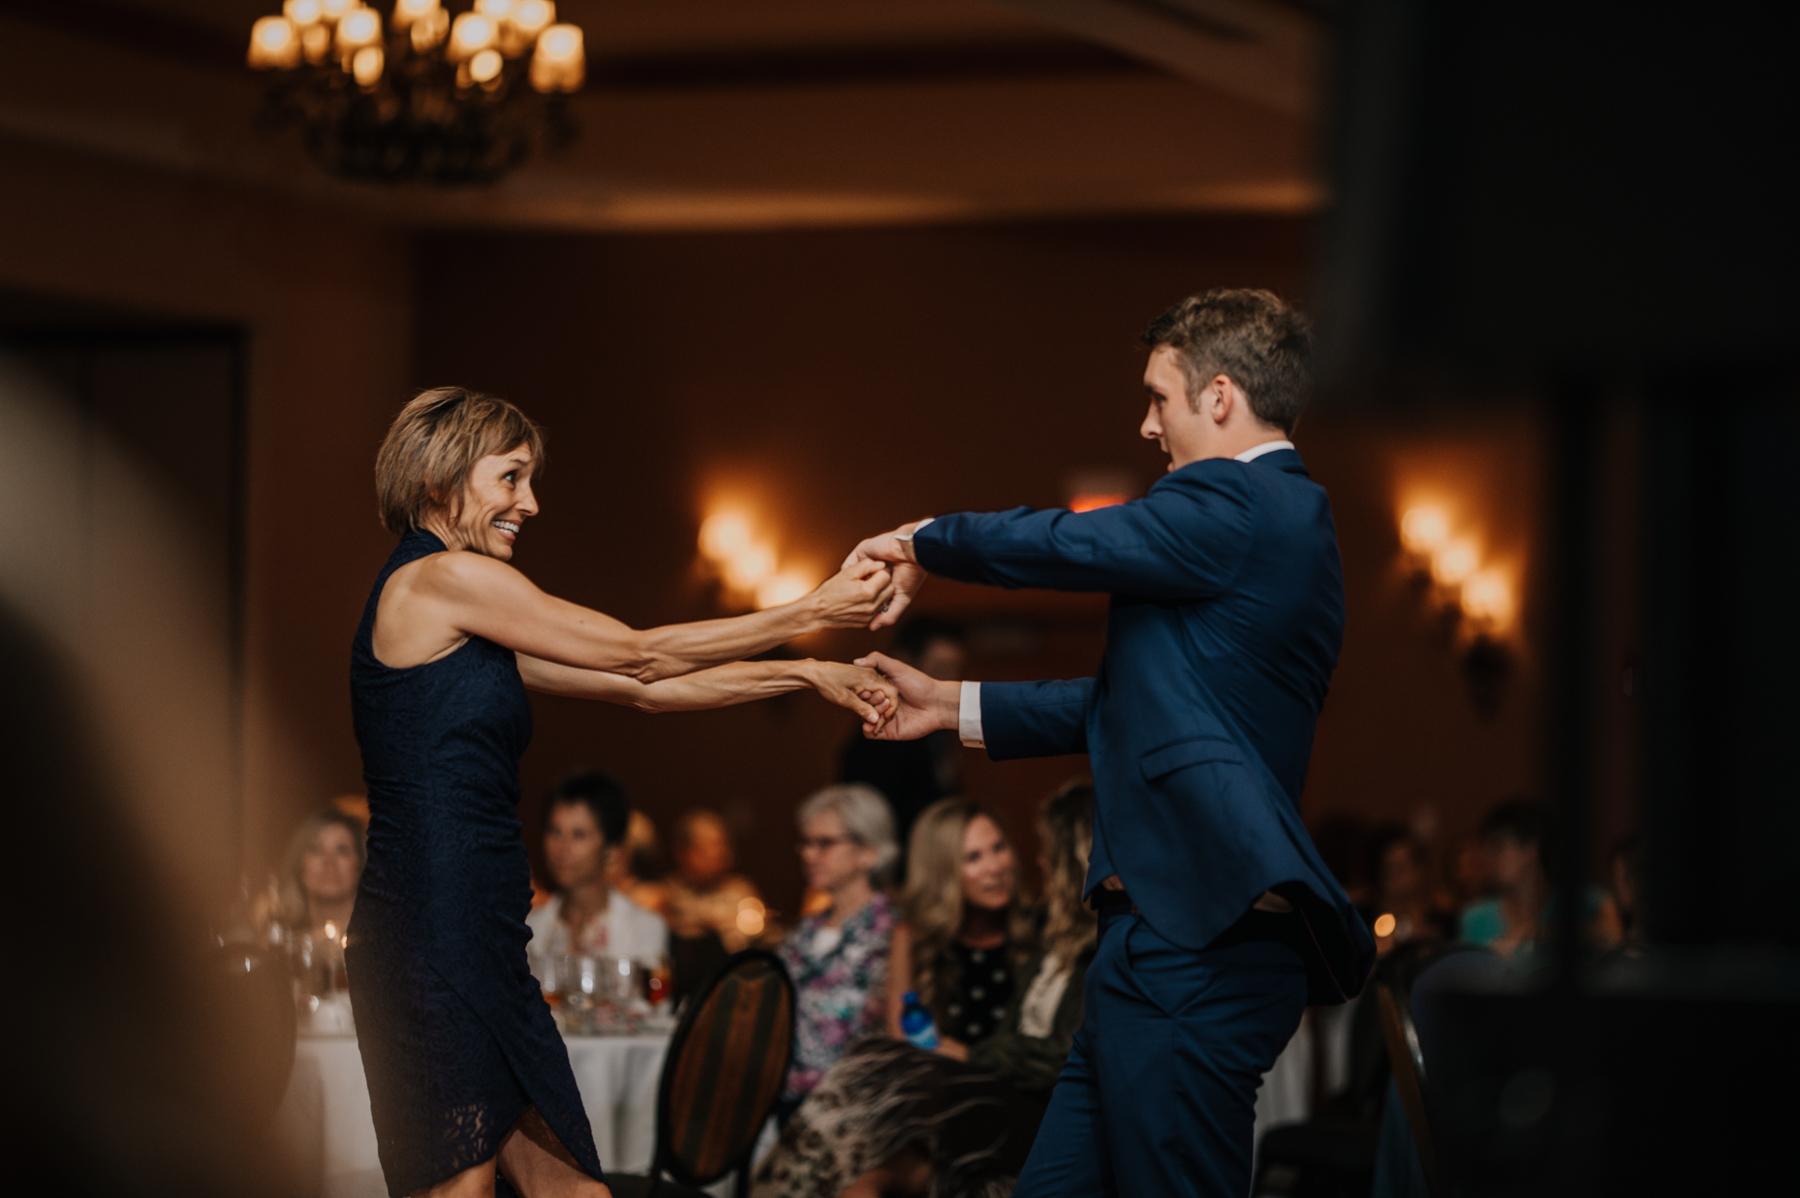 830 Montana Wedding Photographer_St. Francis Wedding_Tifani Zanto + Ryan Burke -6311-3.jpg